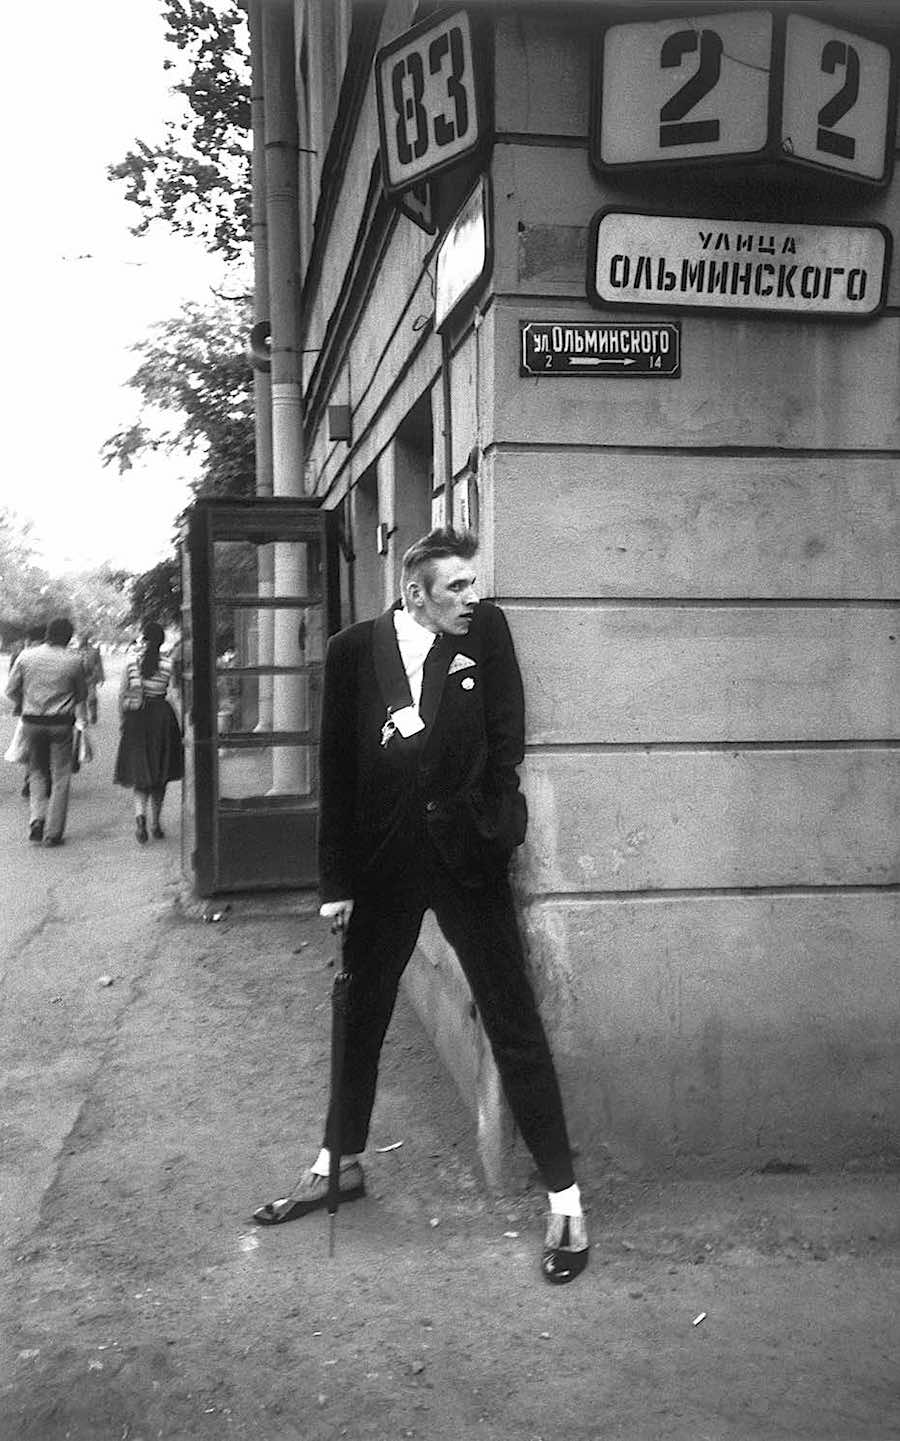 1980s Russia alt fashion, a photograph